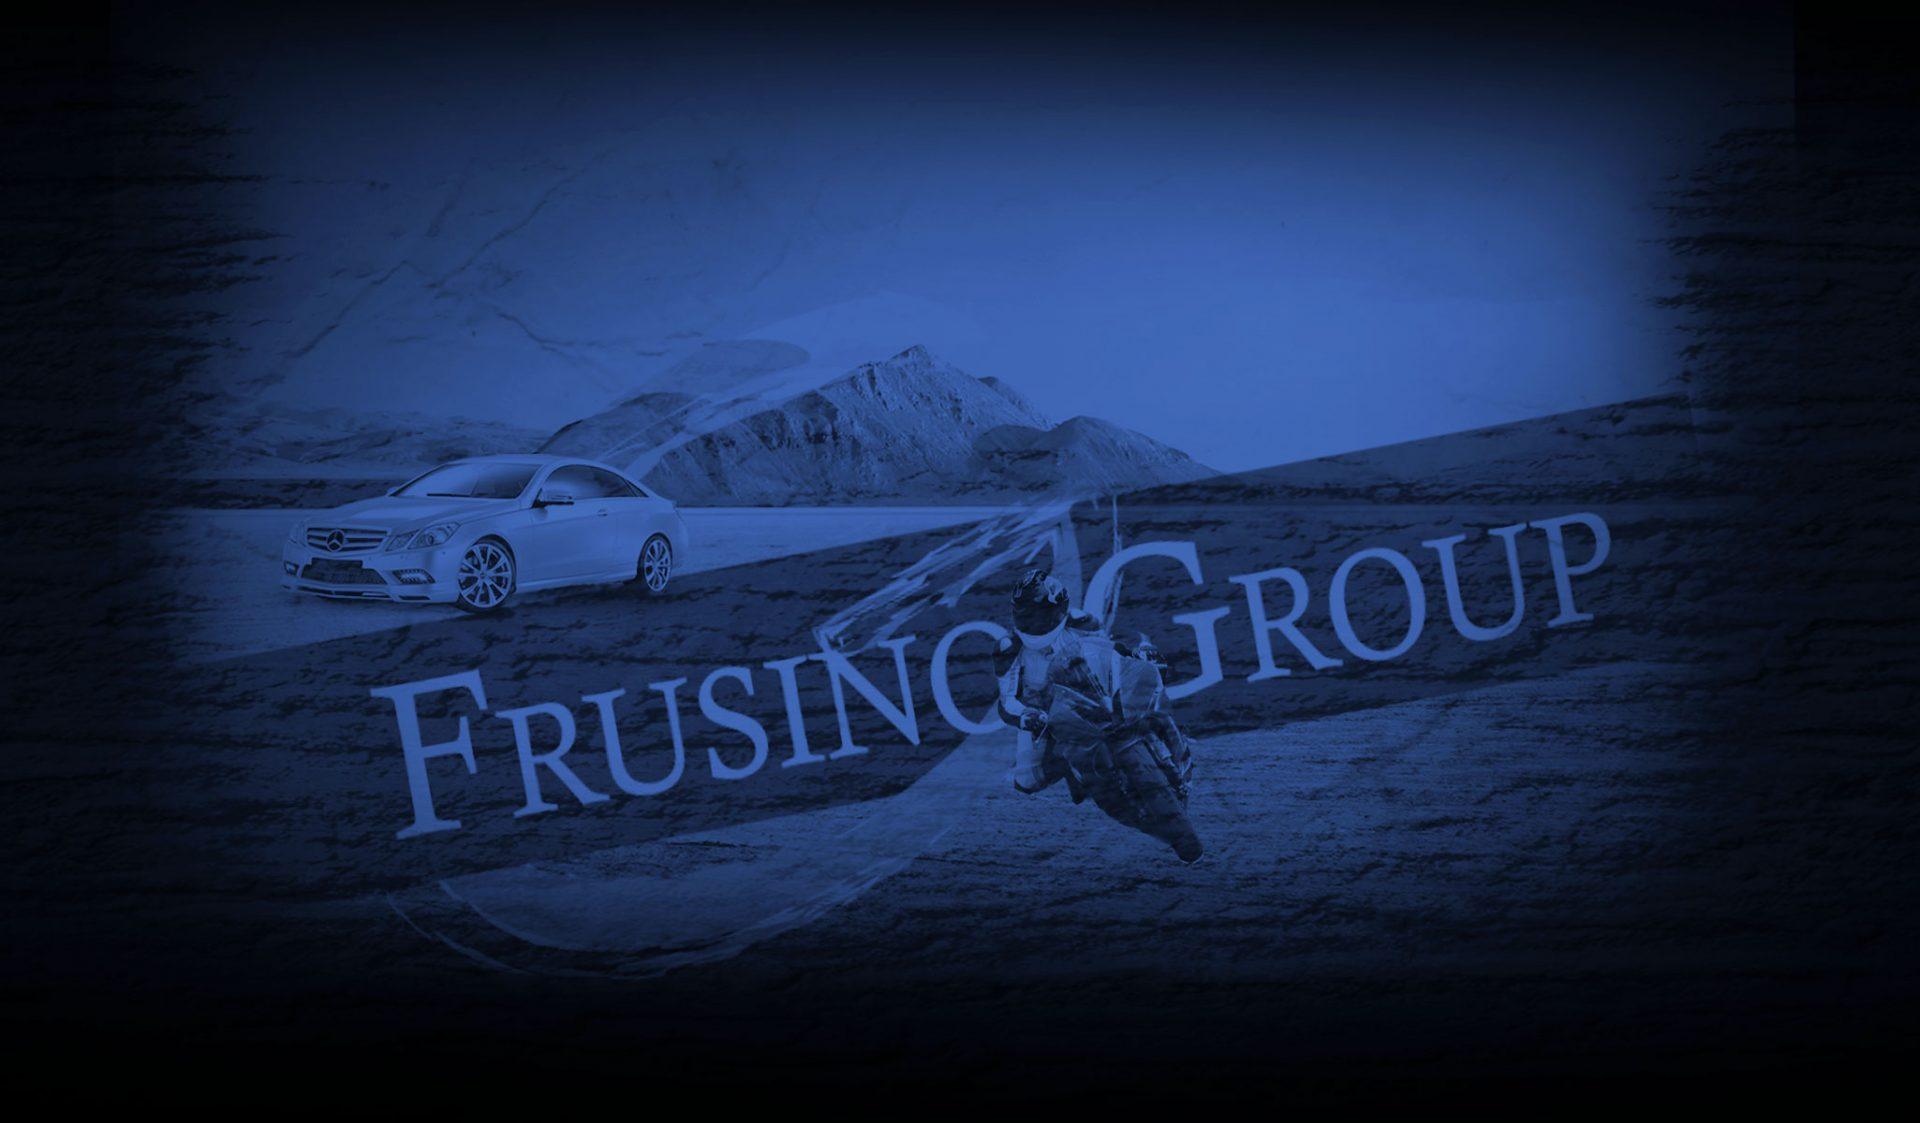 Frusino Group